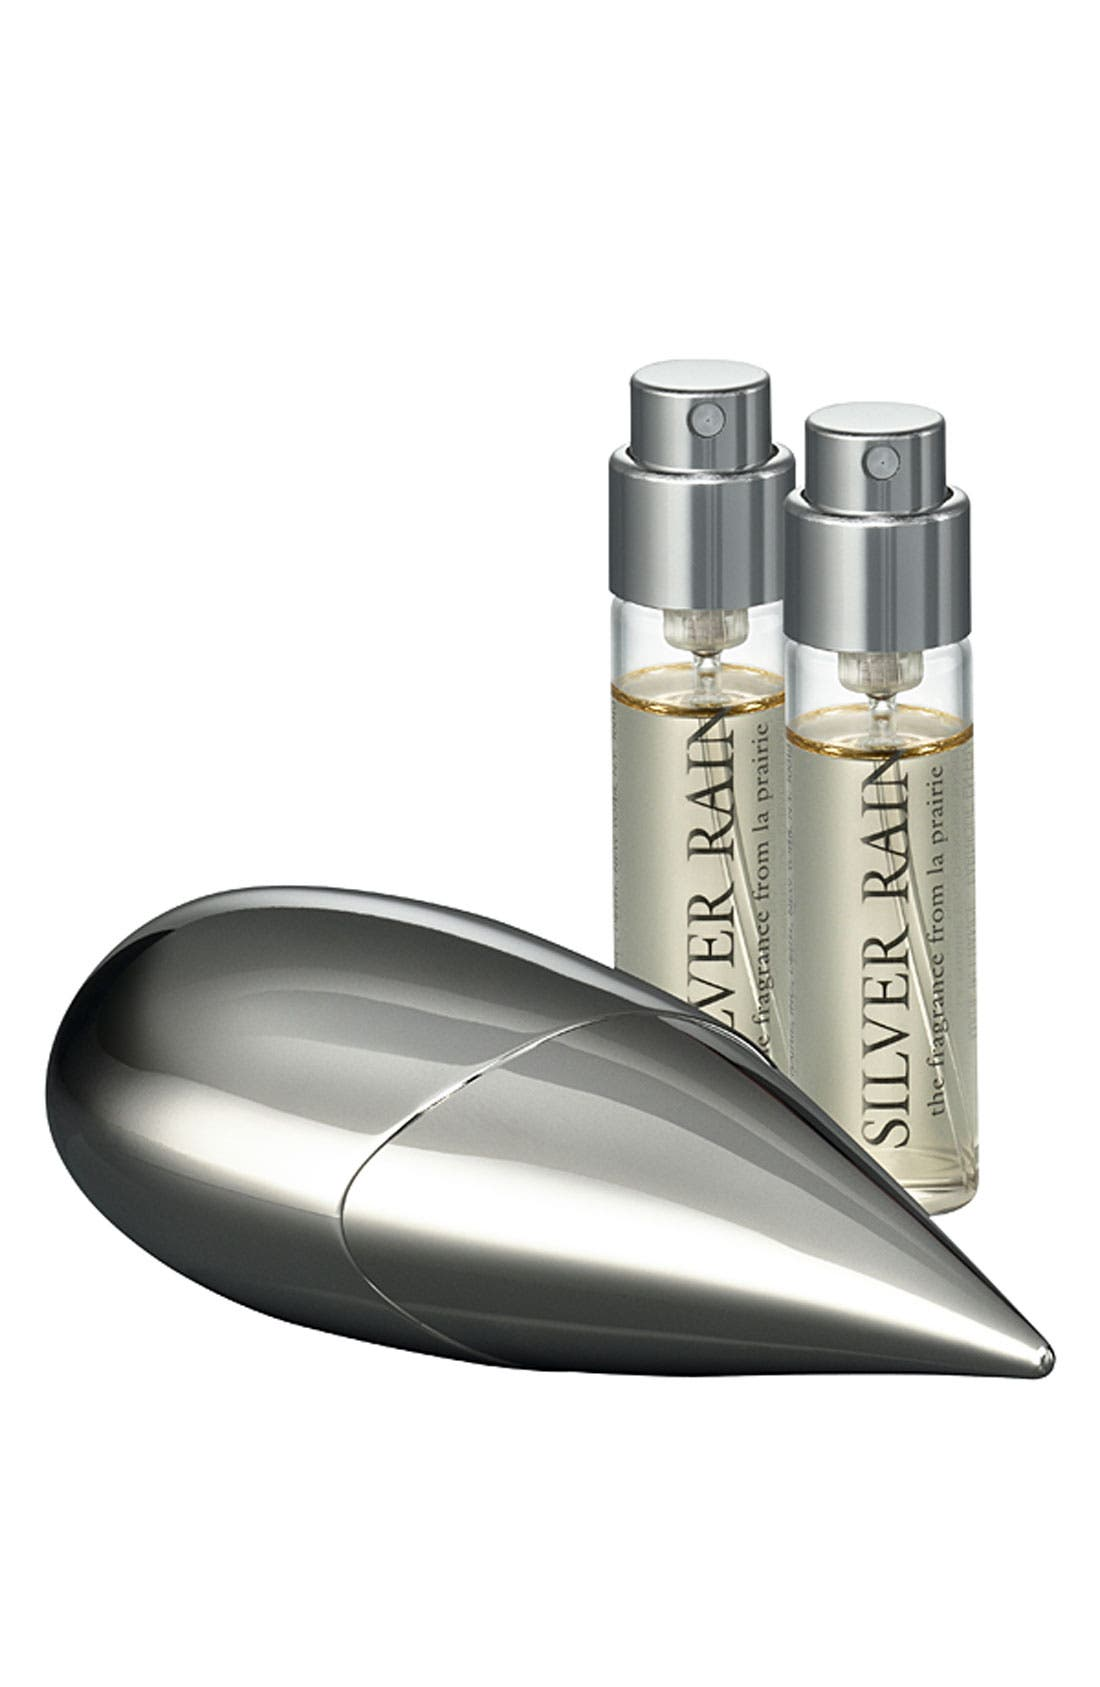 'Silver Rain' Eau de Parfum Purse Spray,                             Main thumbnail 1, color,                             000